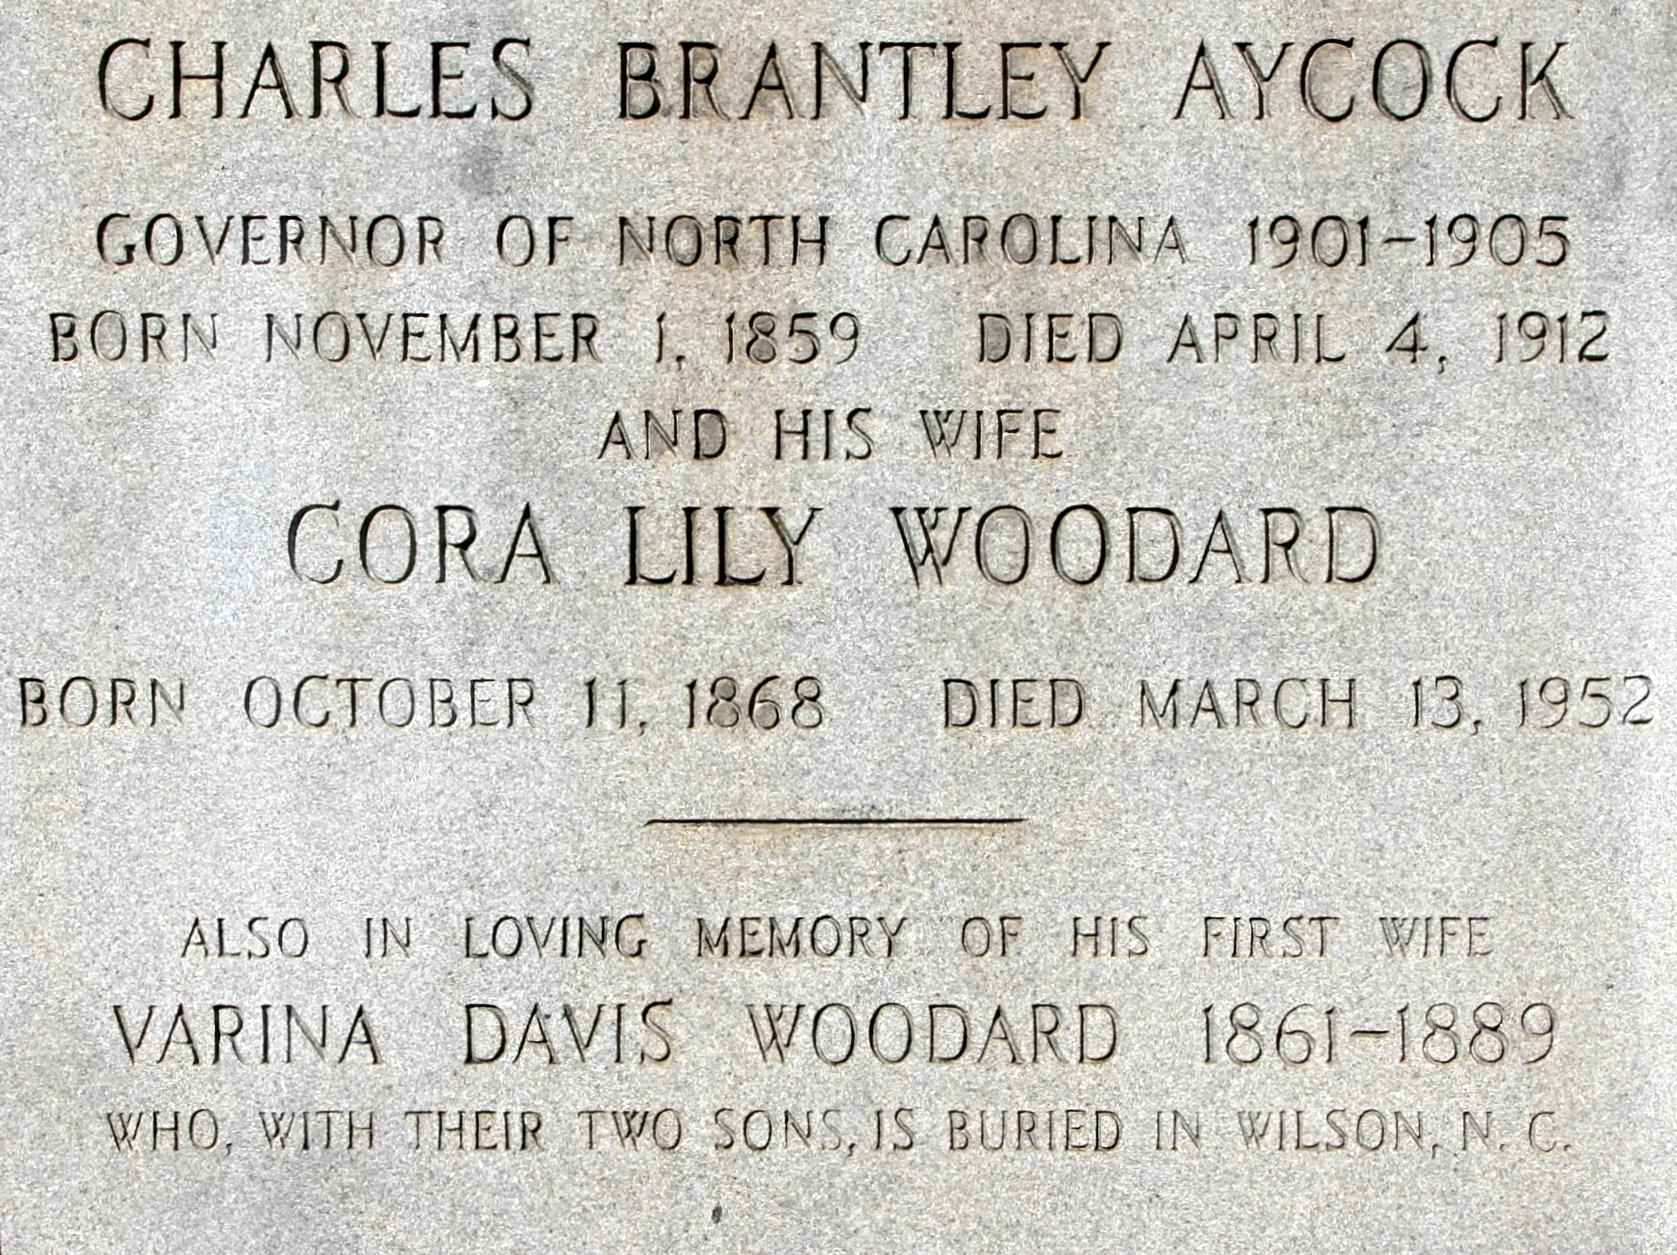 Charles Brantley Aycock